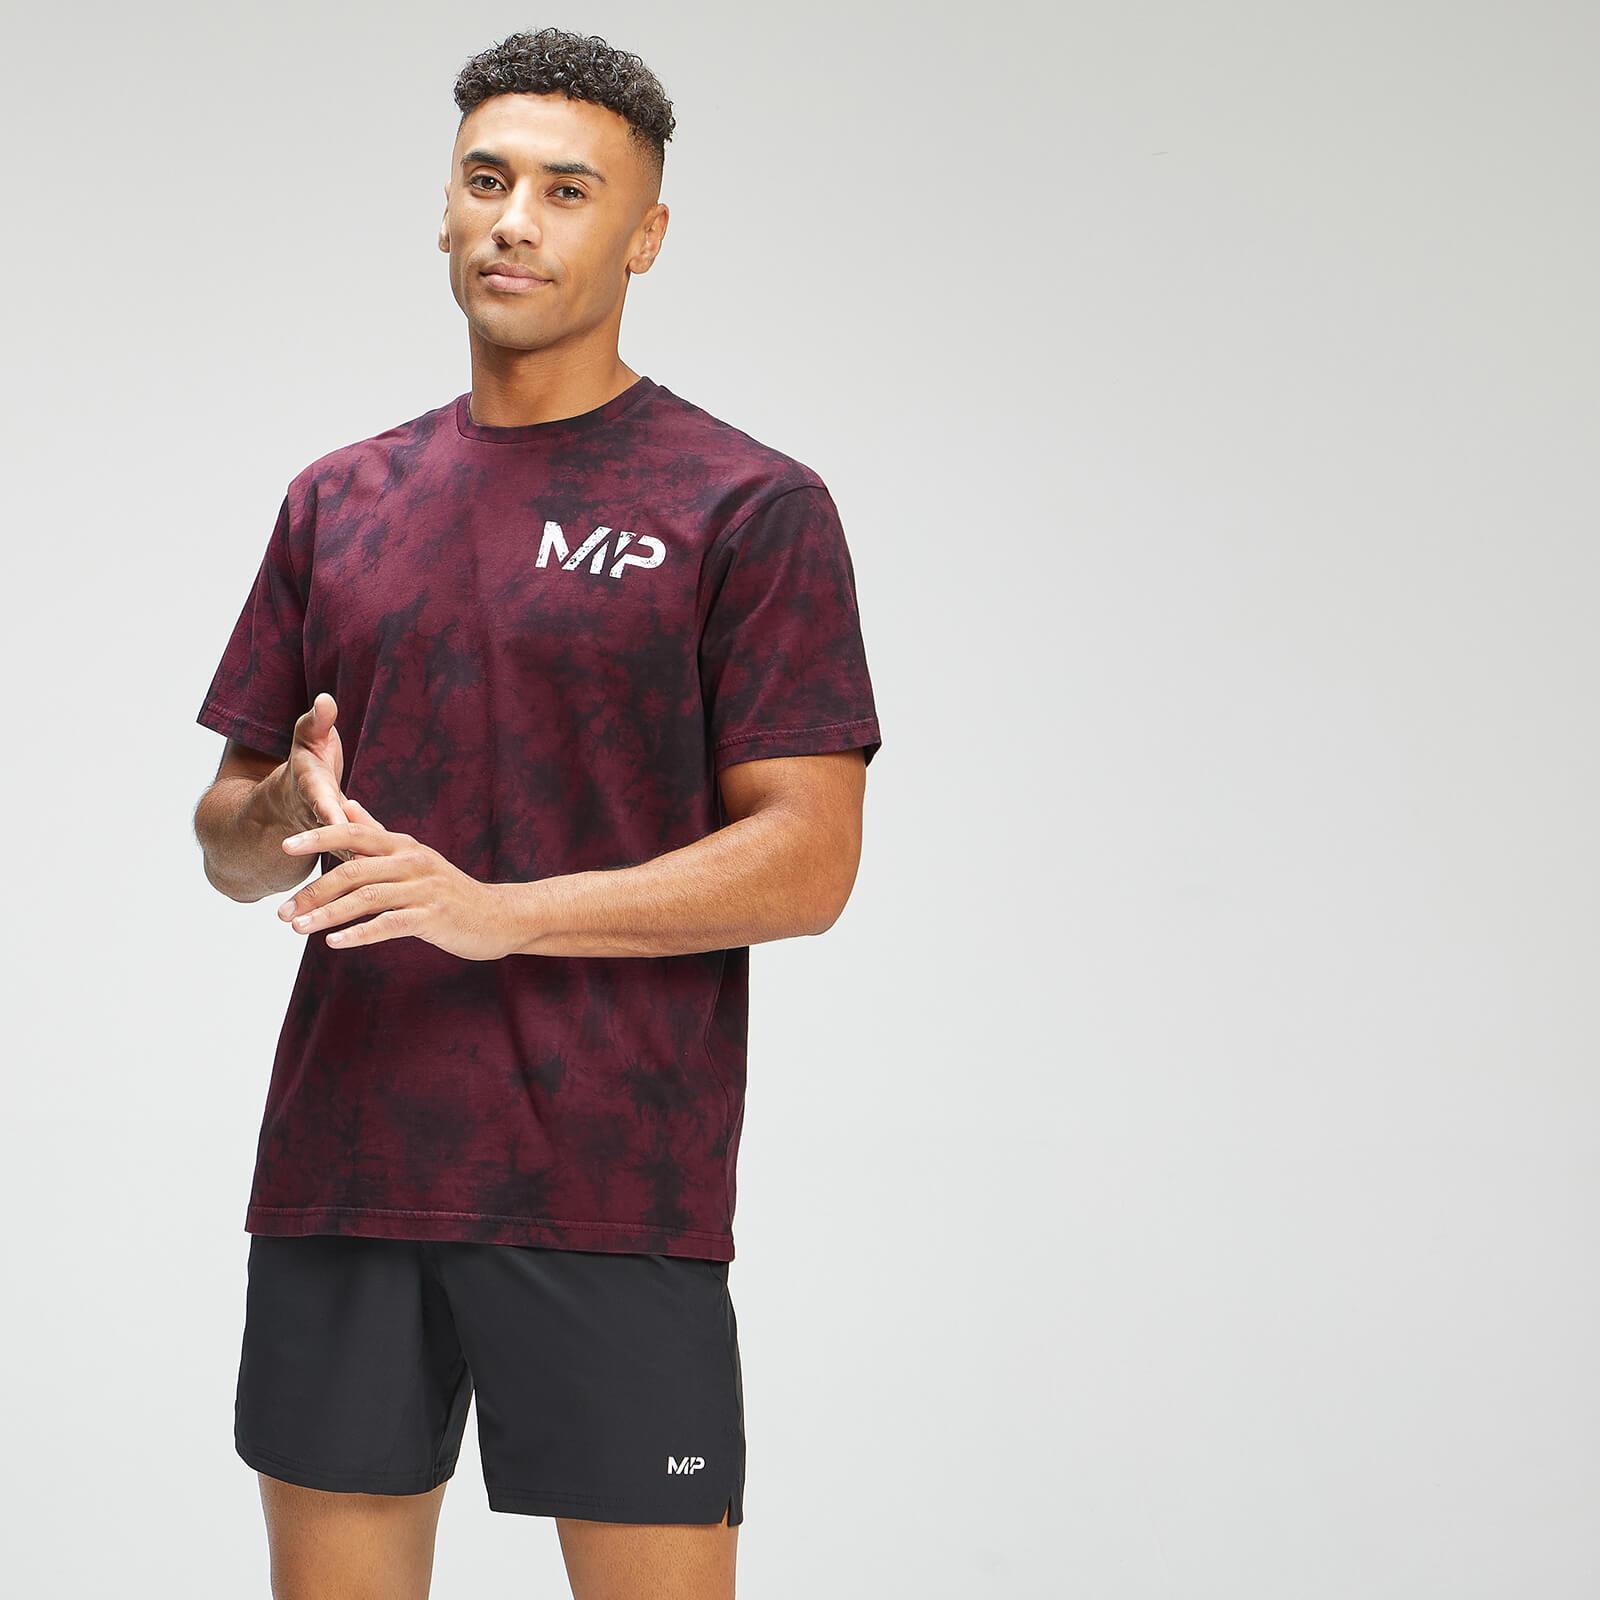 Купить MP Men's Adapt Tie Dye Short Sleeve Oversized T-Shirt - Black/Merlot - XXS, Myprotein International